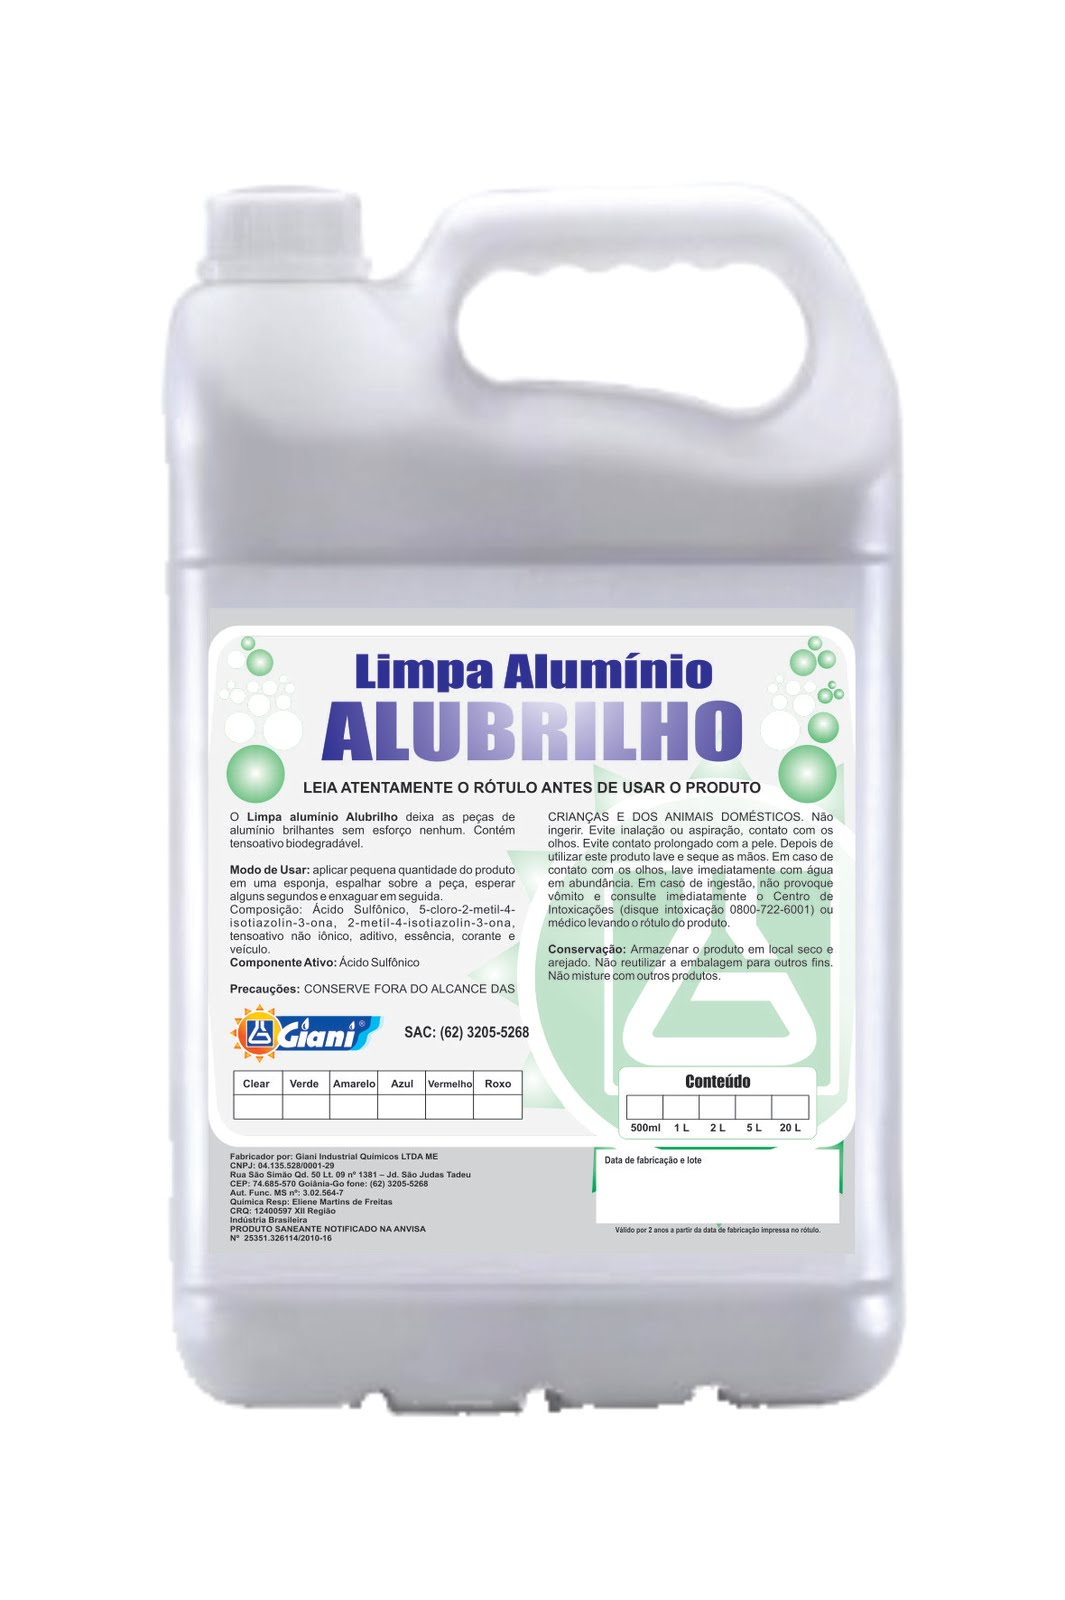 #AF721C Limpa Alumínio Alubrilho Giani Produtos de Limpeza 1652 Janela De Aluminio Limpeza